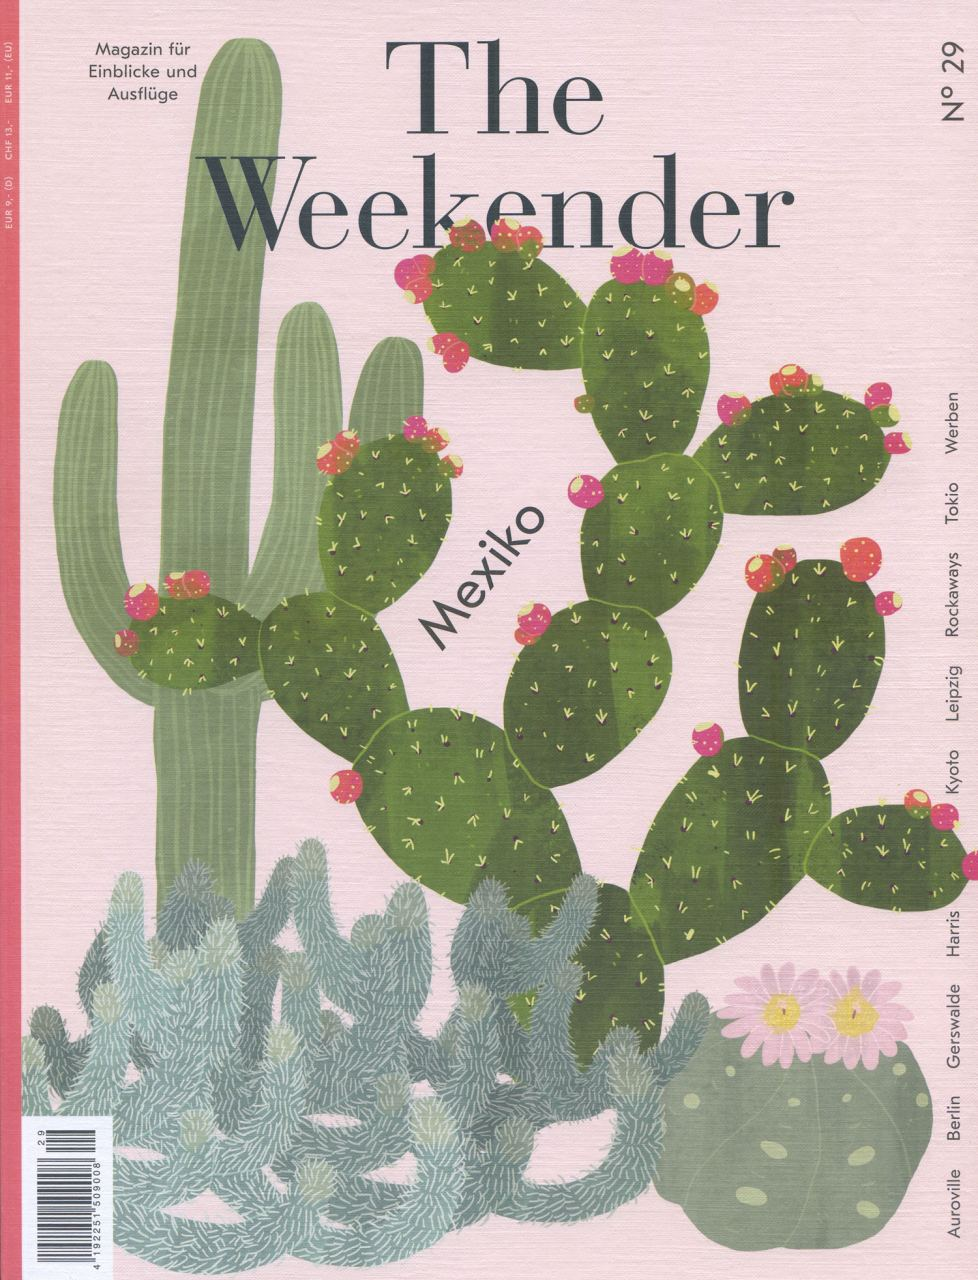 The Weekender No. 29